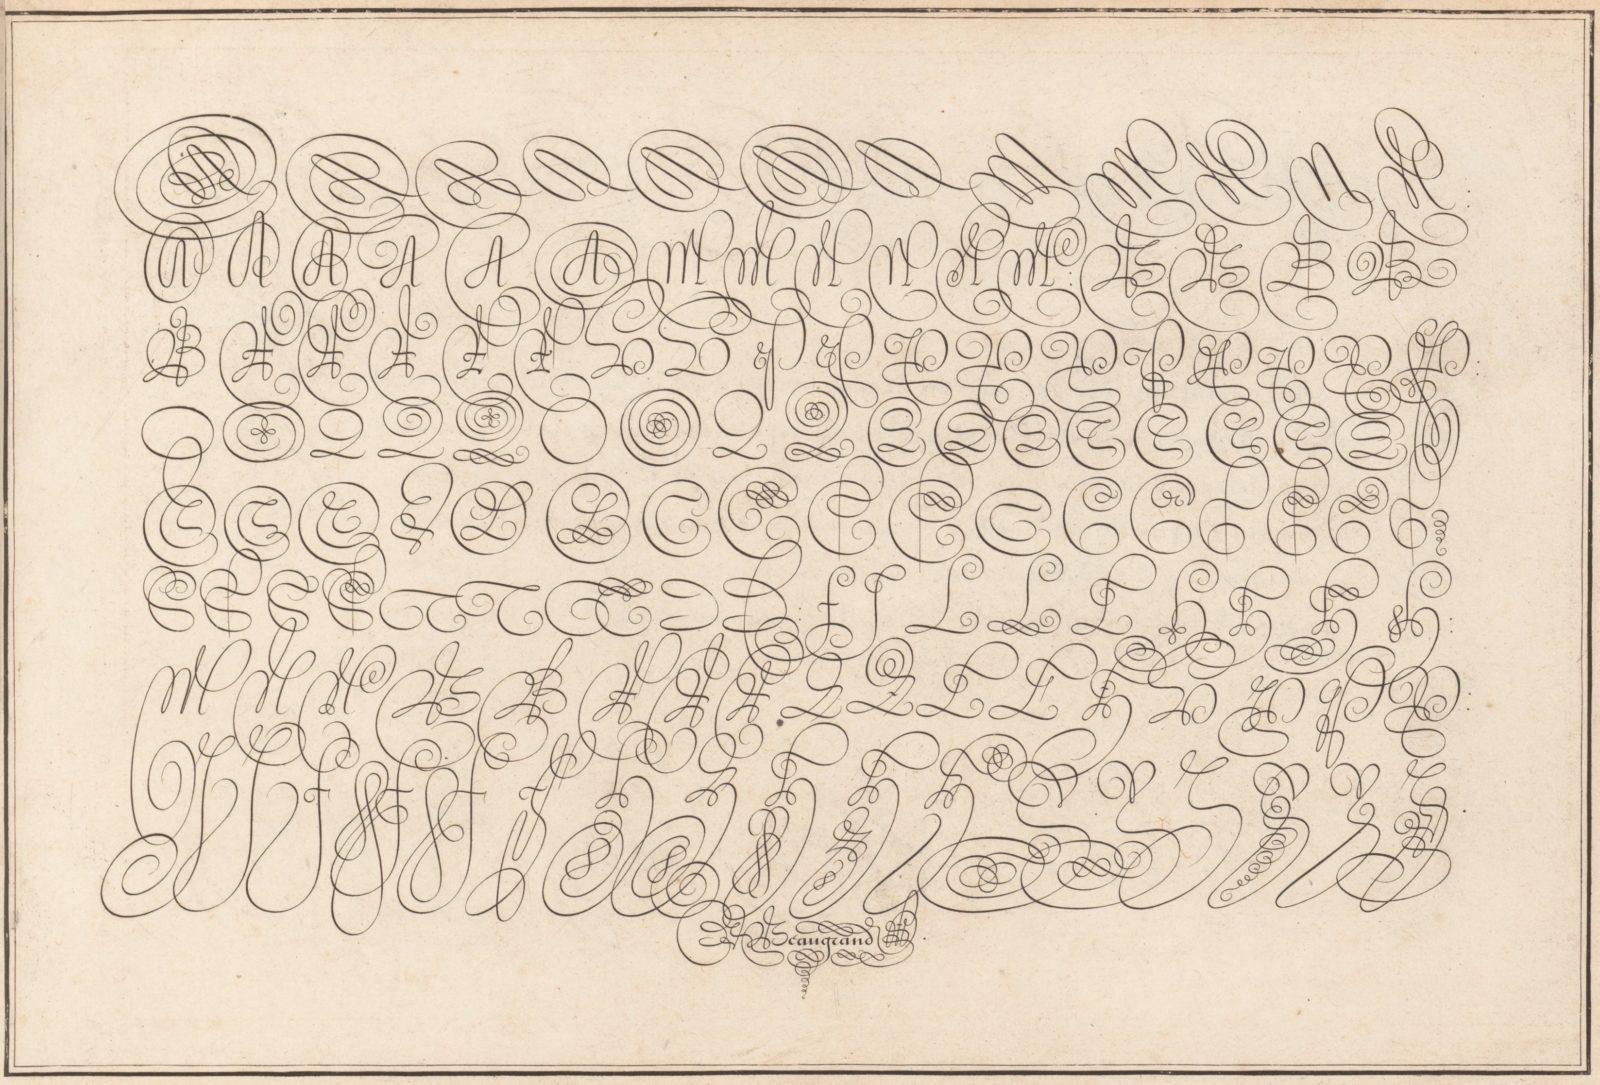 Panchrestographie & Poecilographie